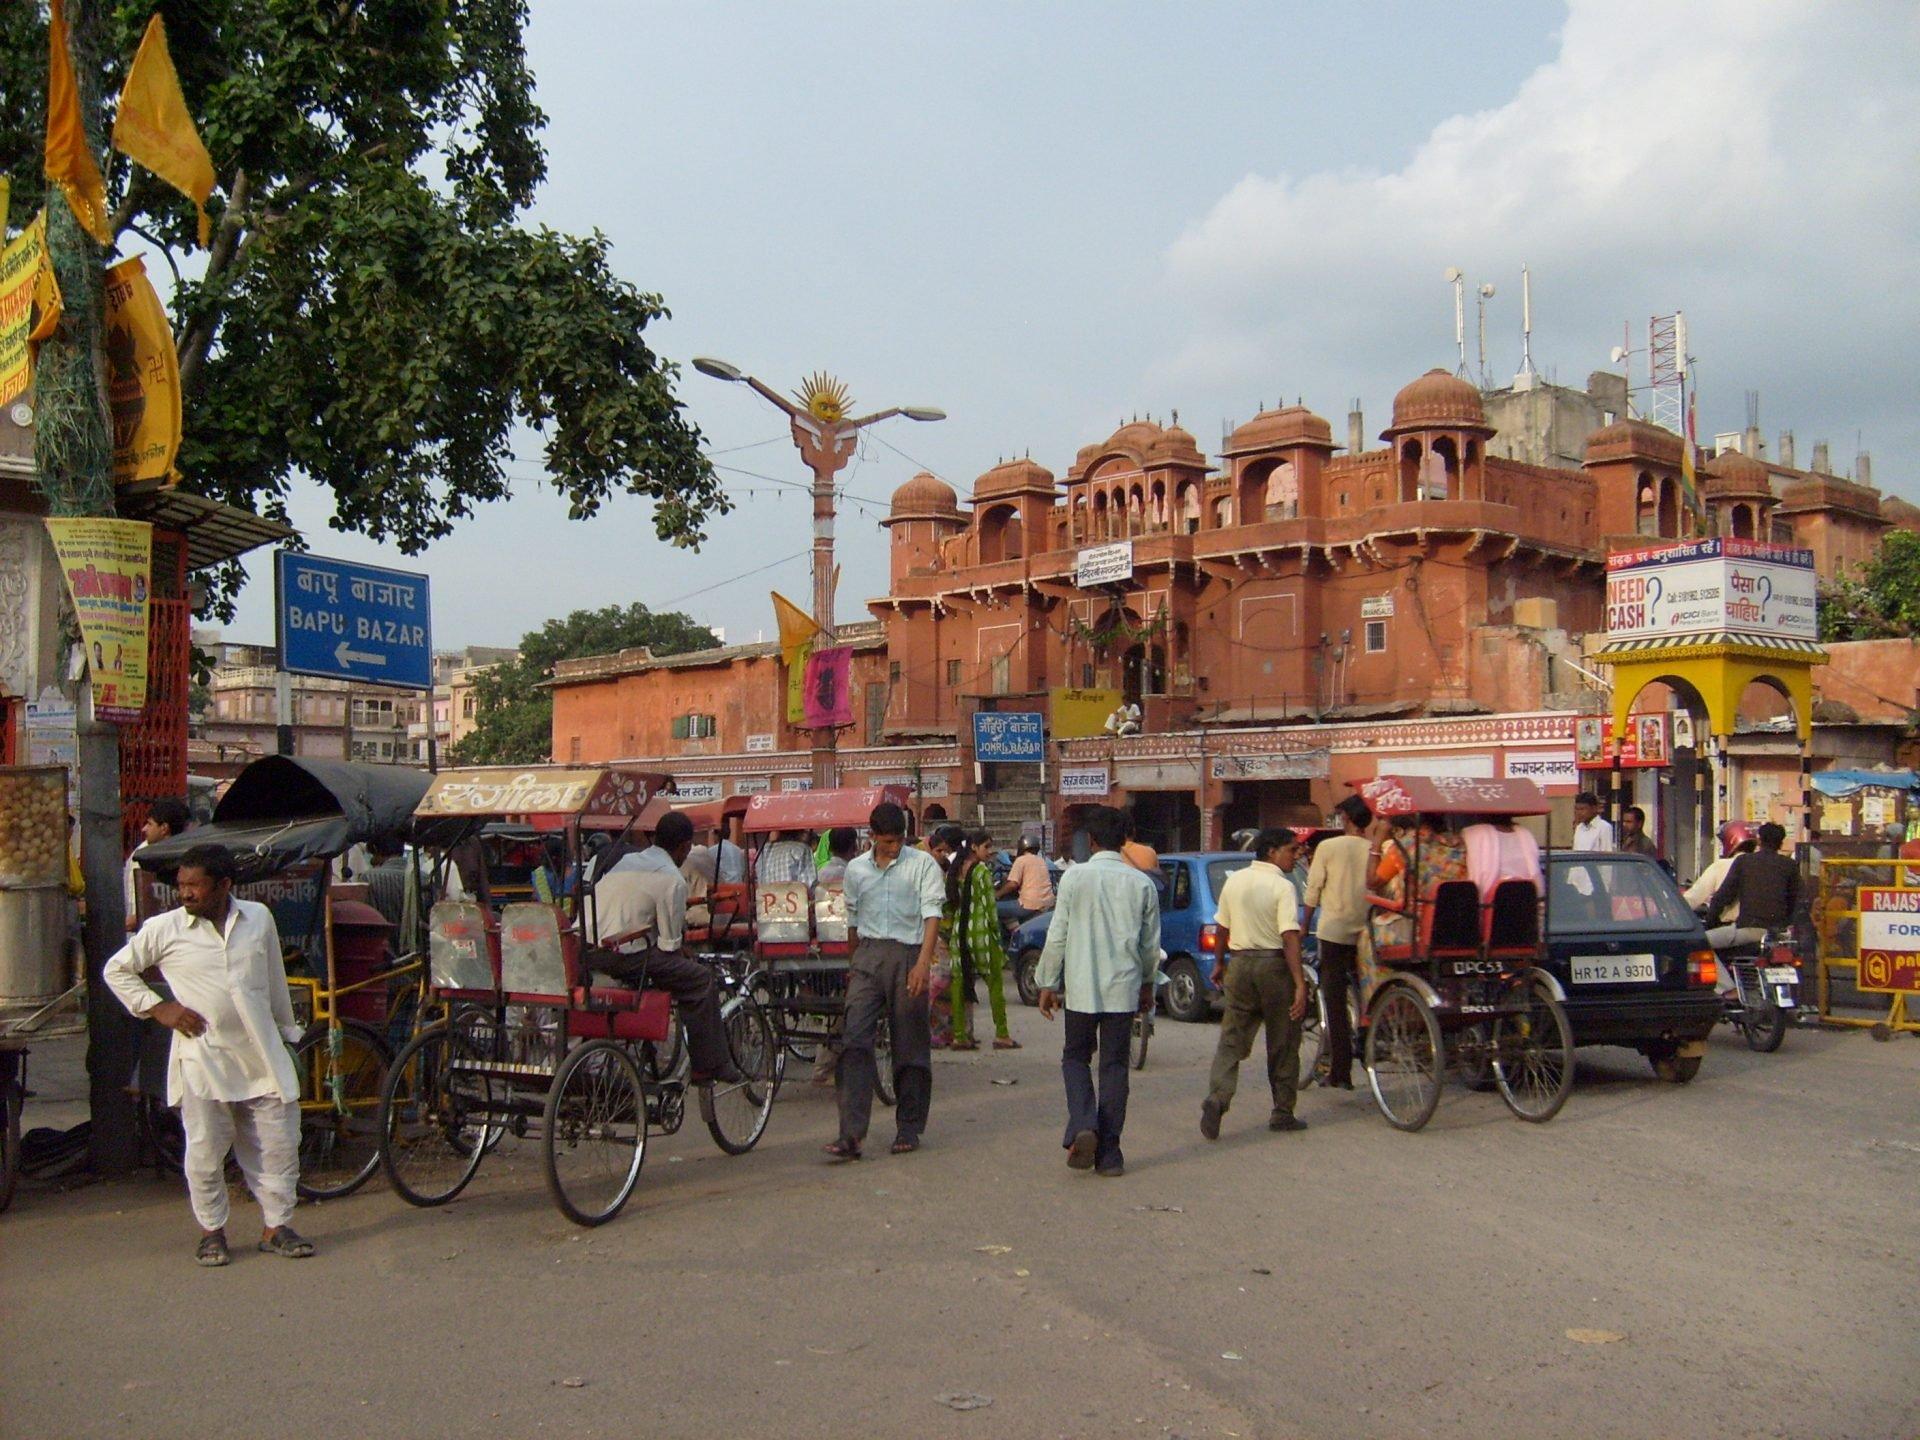 Intia Delhi Rajasthan kokemuksia matka